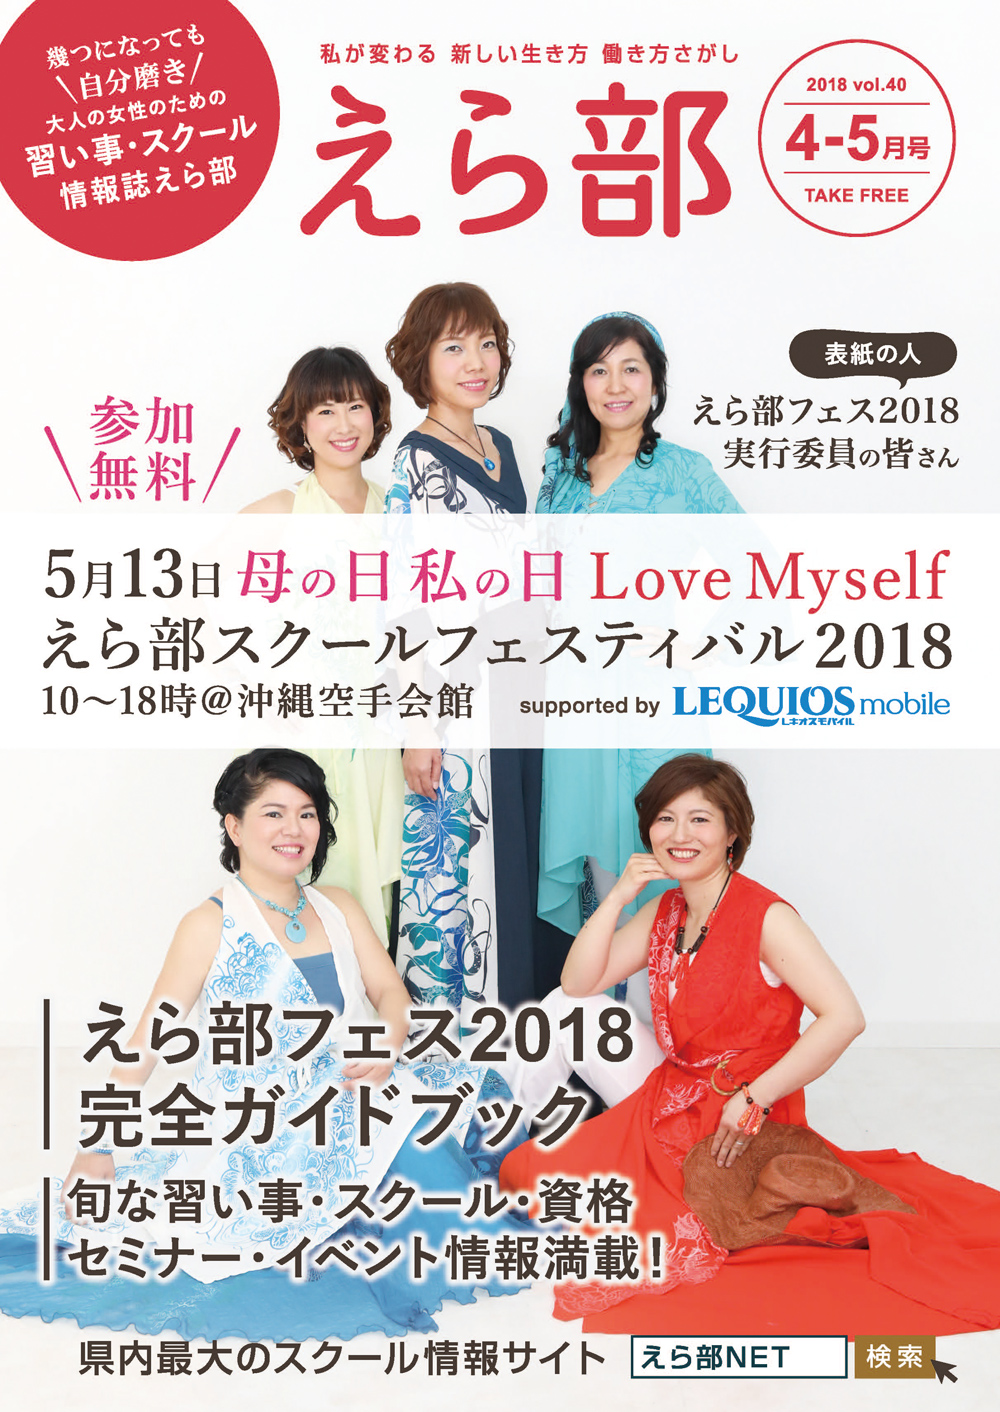 1p_2018_04_05_hyoushi_02